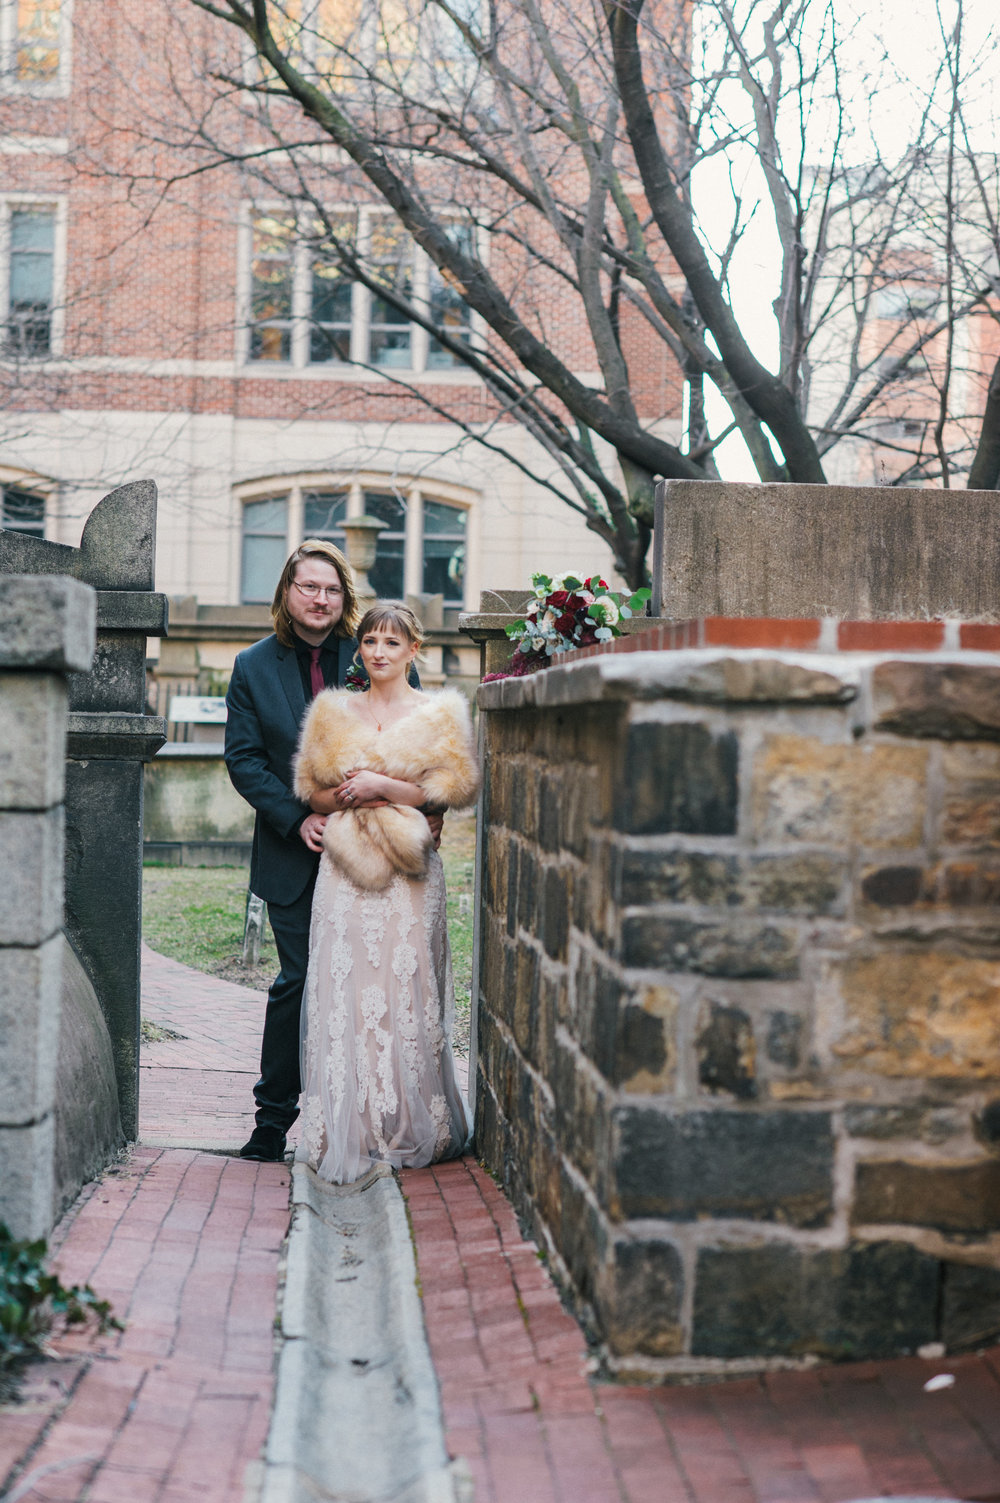 Amber and Kyles Wedding 34.jpg